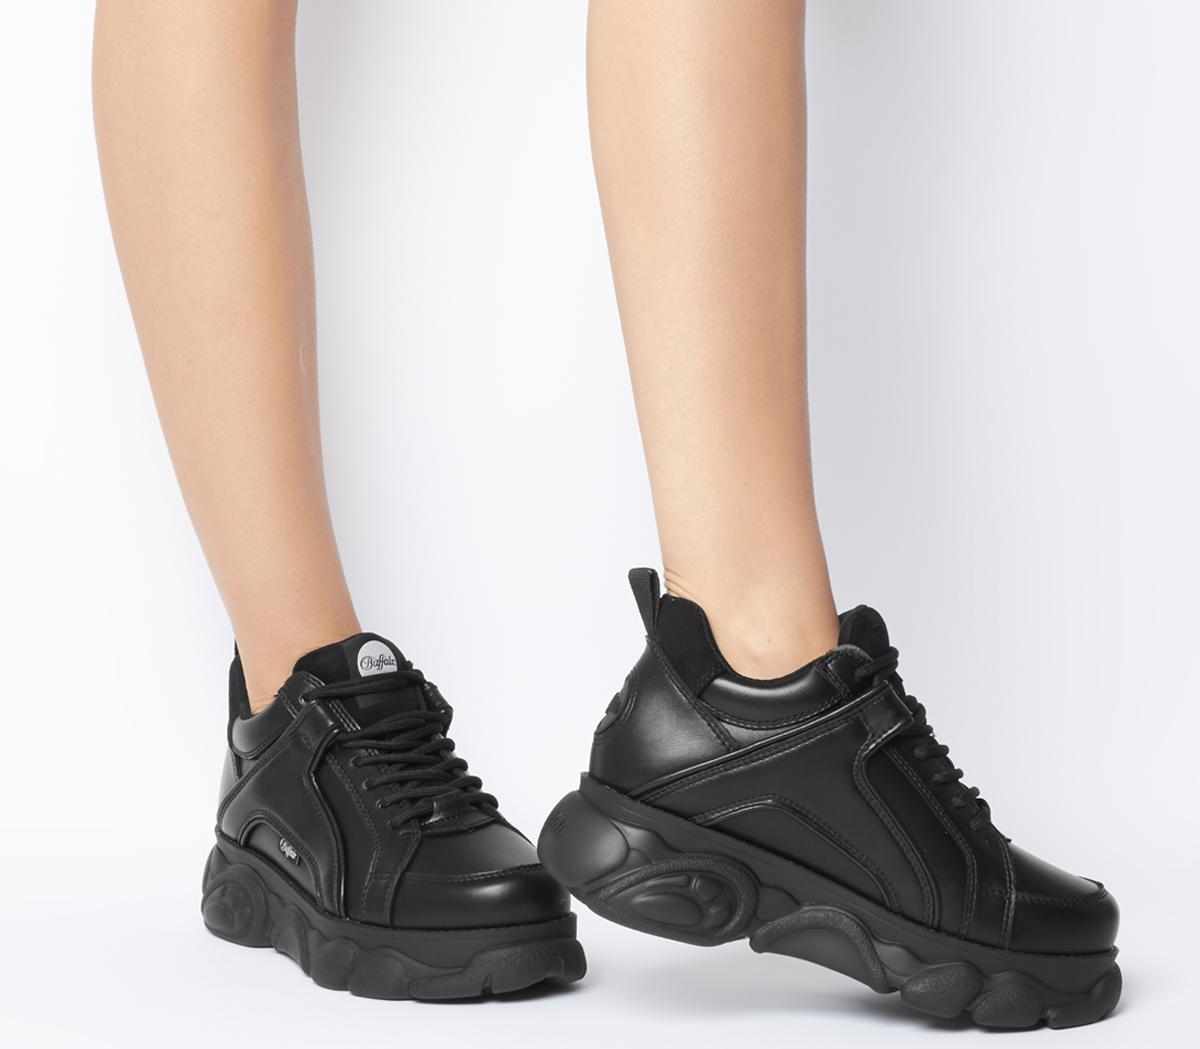 Corin Low Sneakers